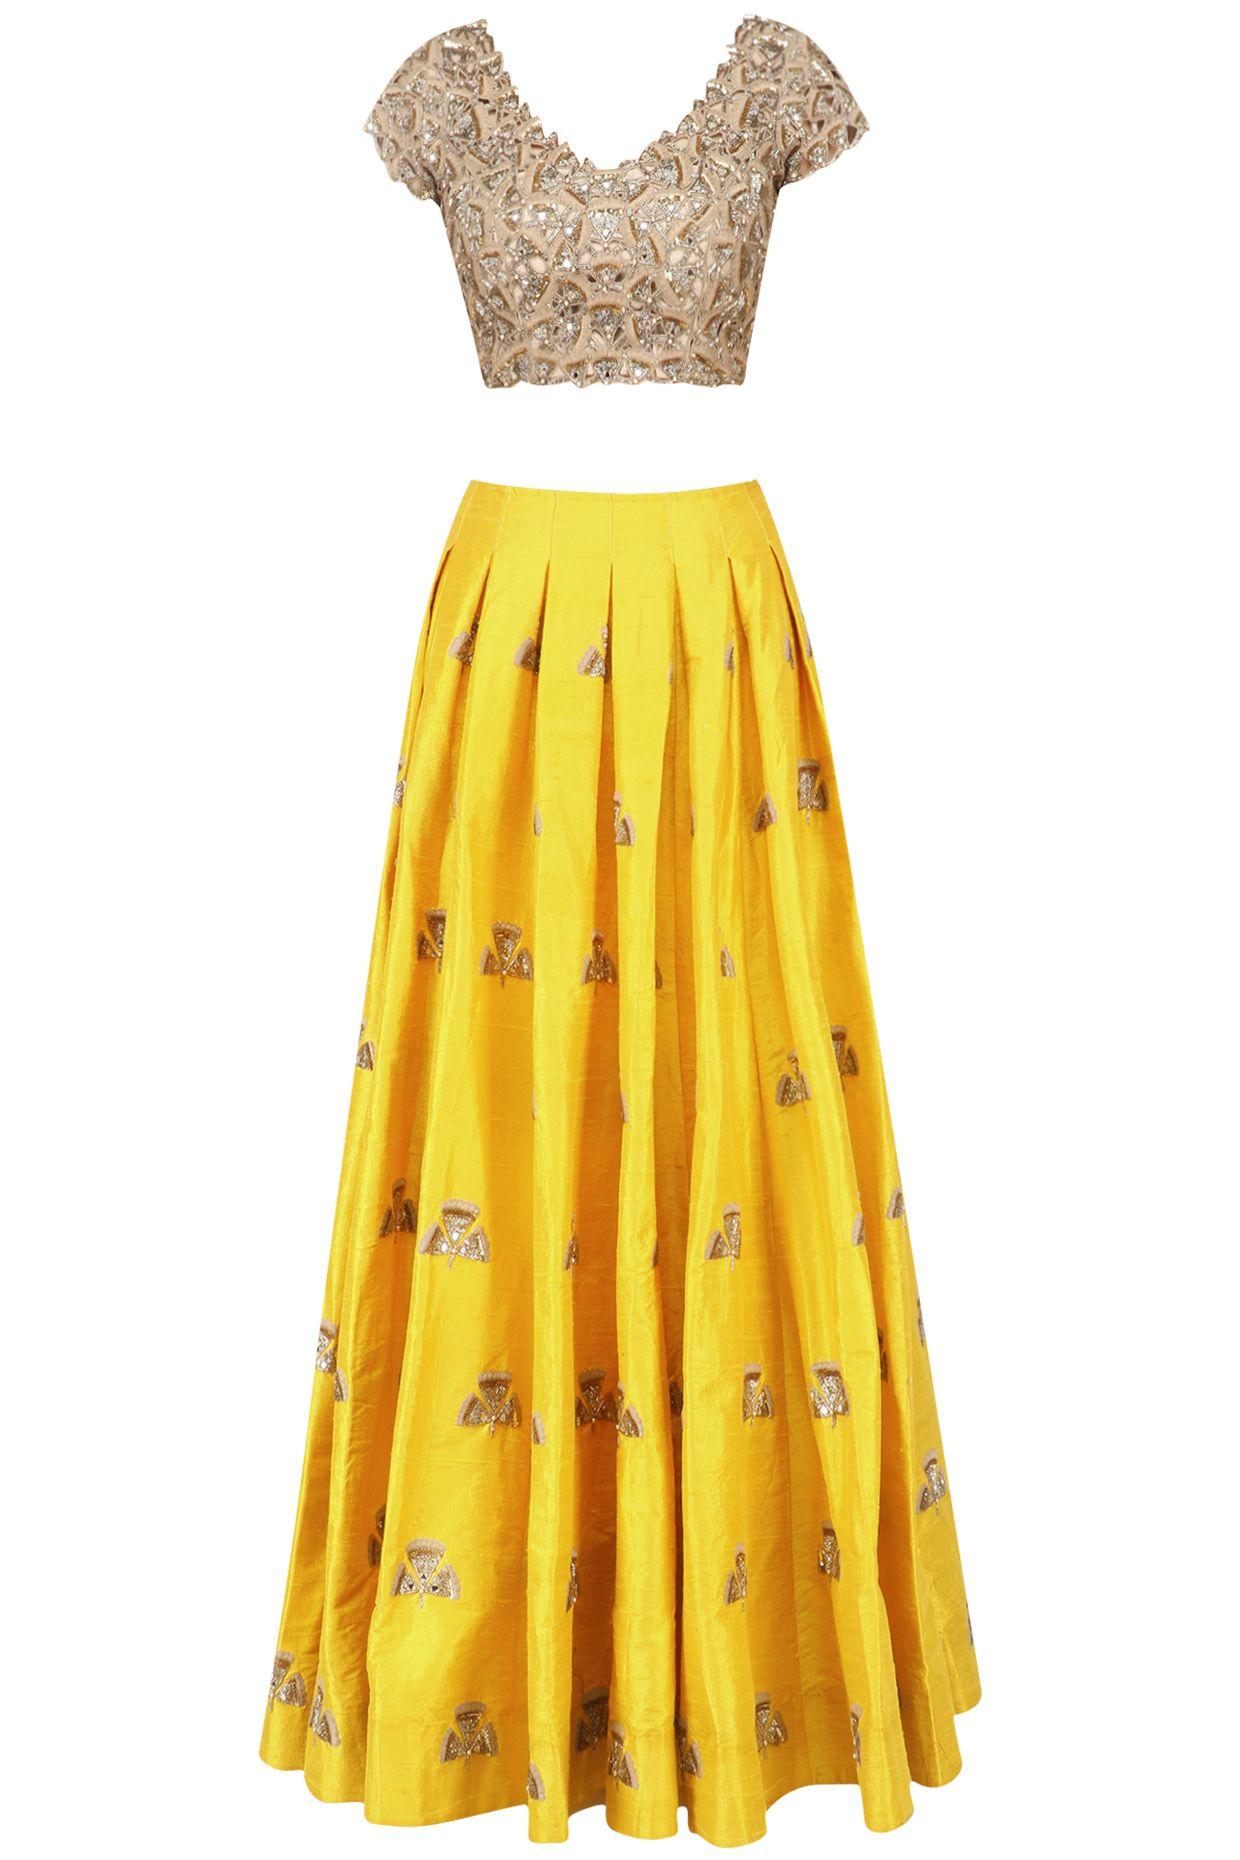 Yellow Gingko Butti Embroidered Lehenga Skirt And Embroidered Blouse